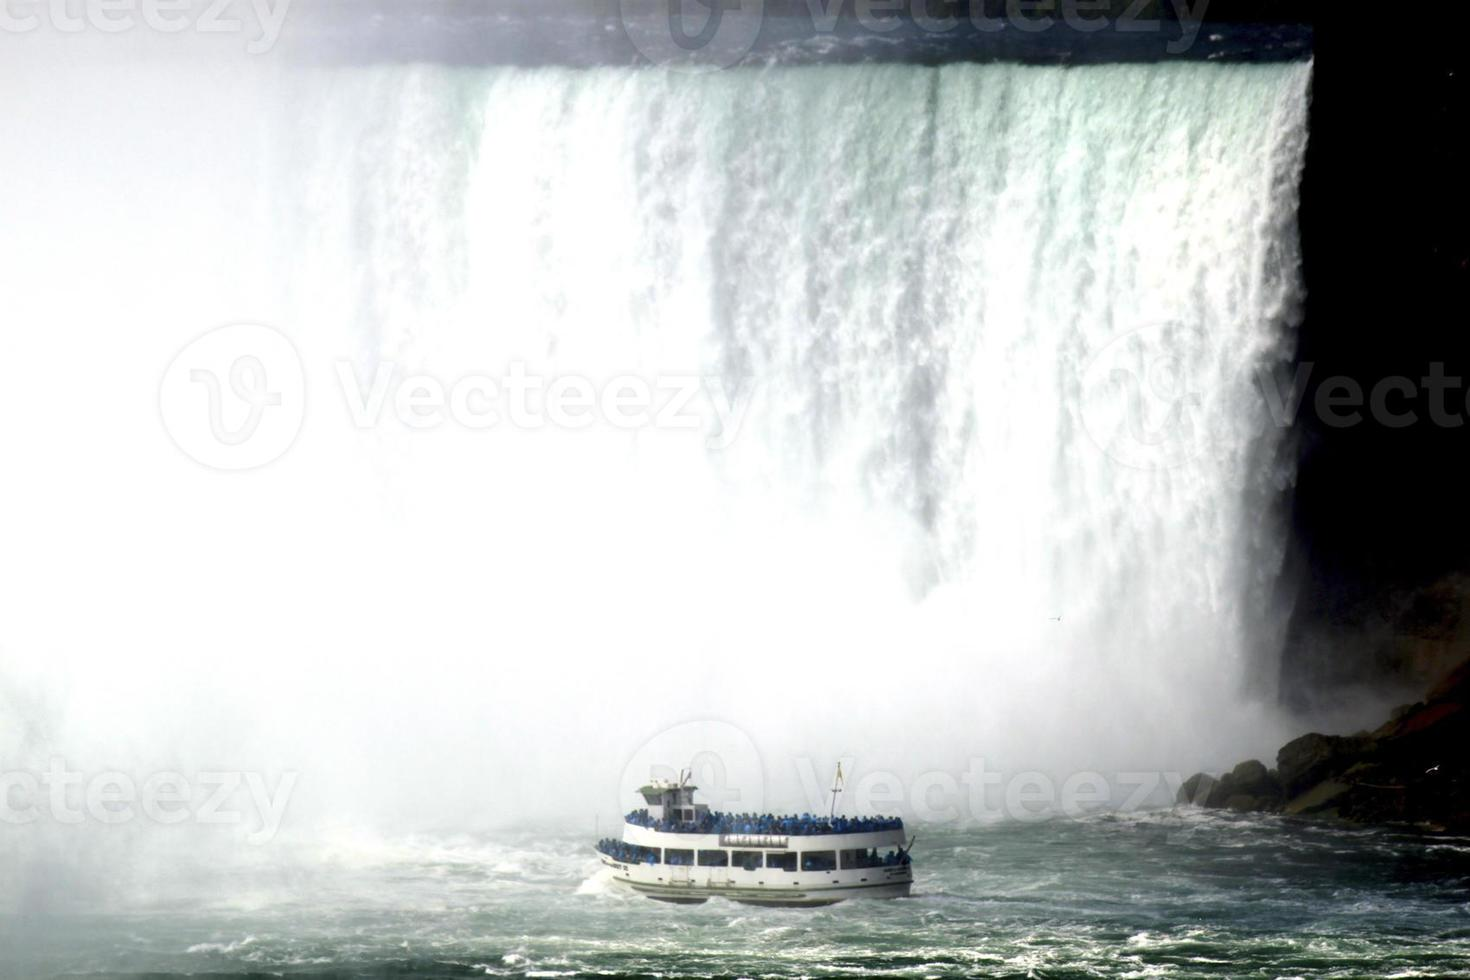 Niagara Falls vs Barco foto